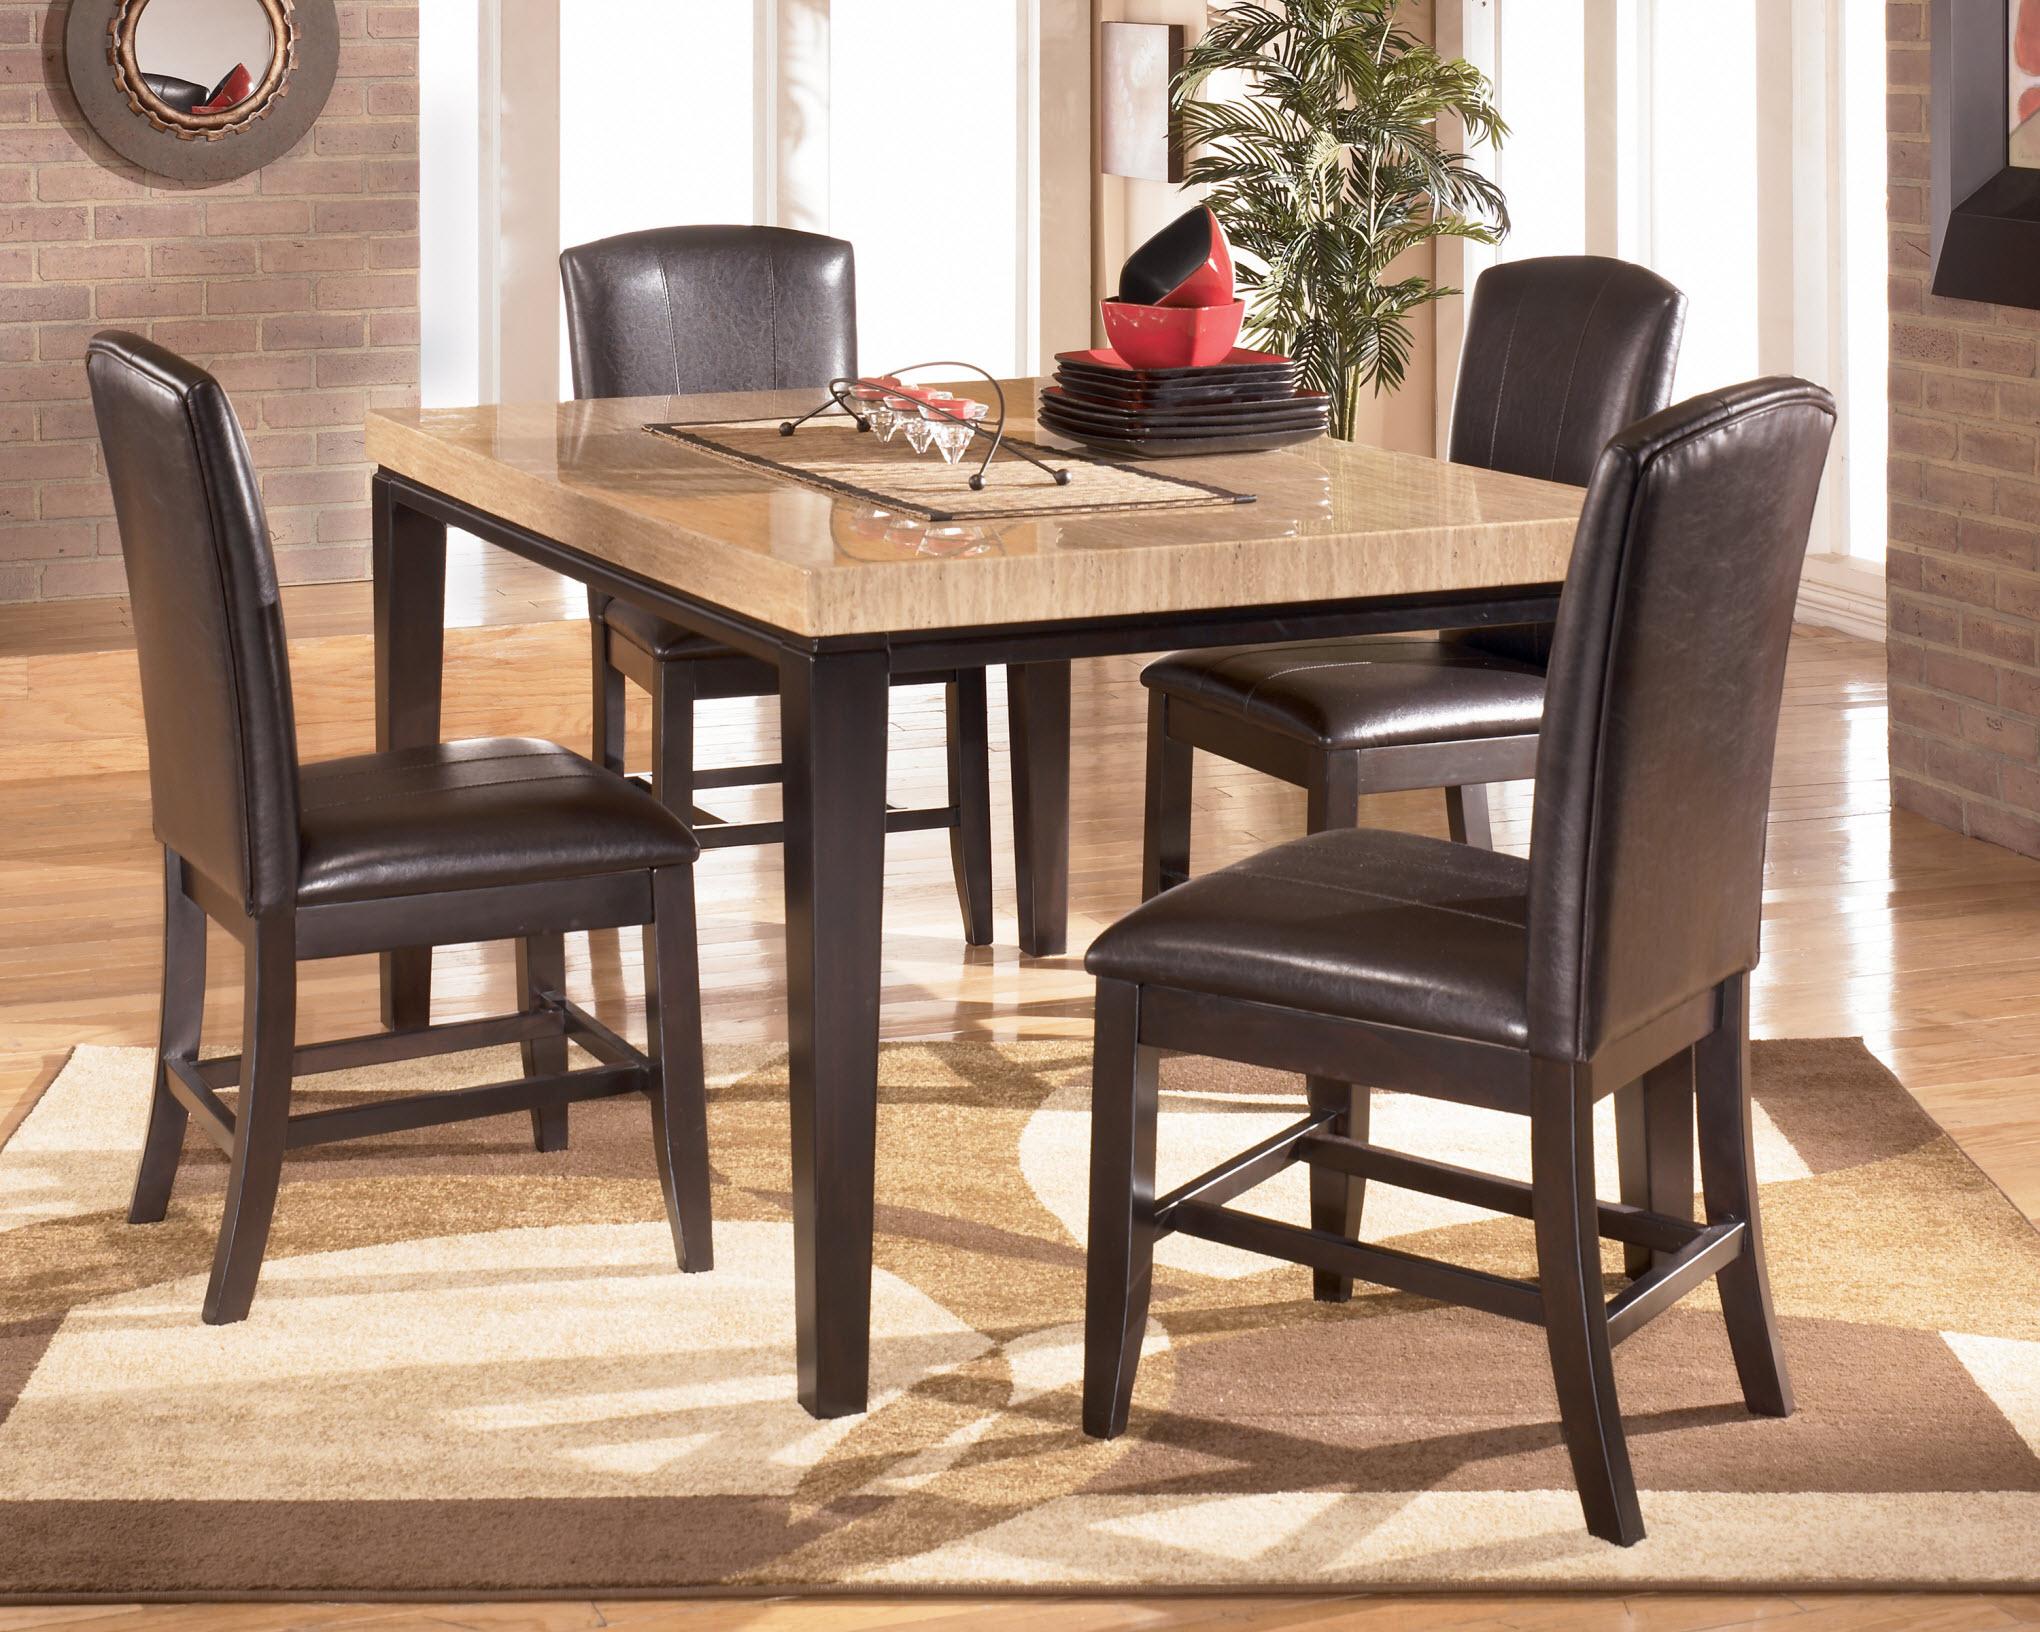 ashley furniture kitchen table appliances list 14 porter coffee ideas